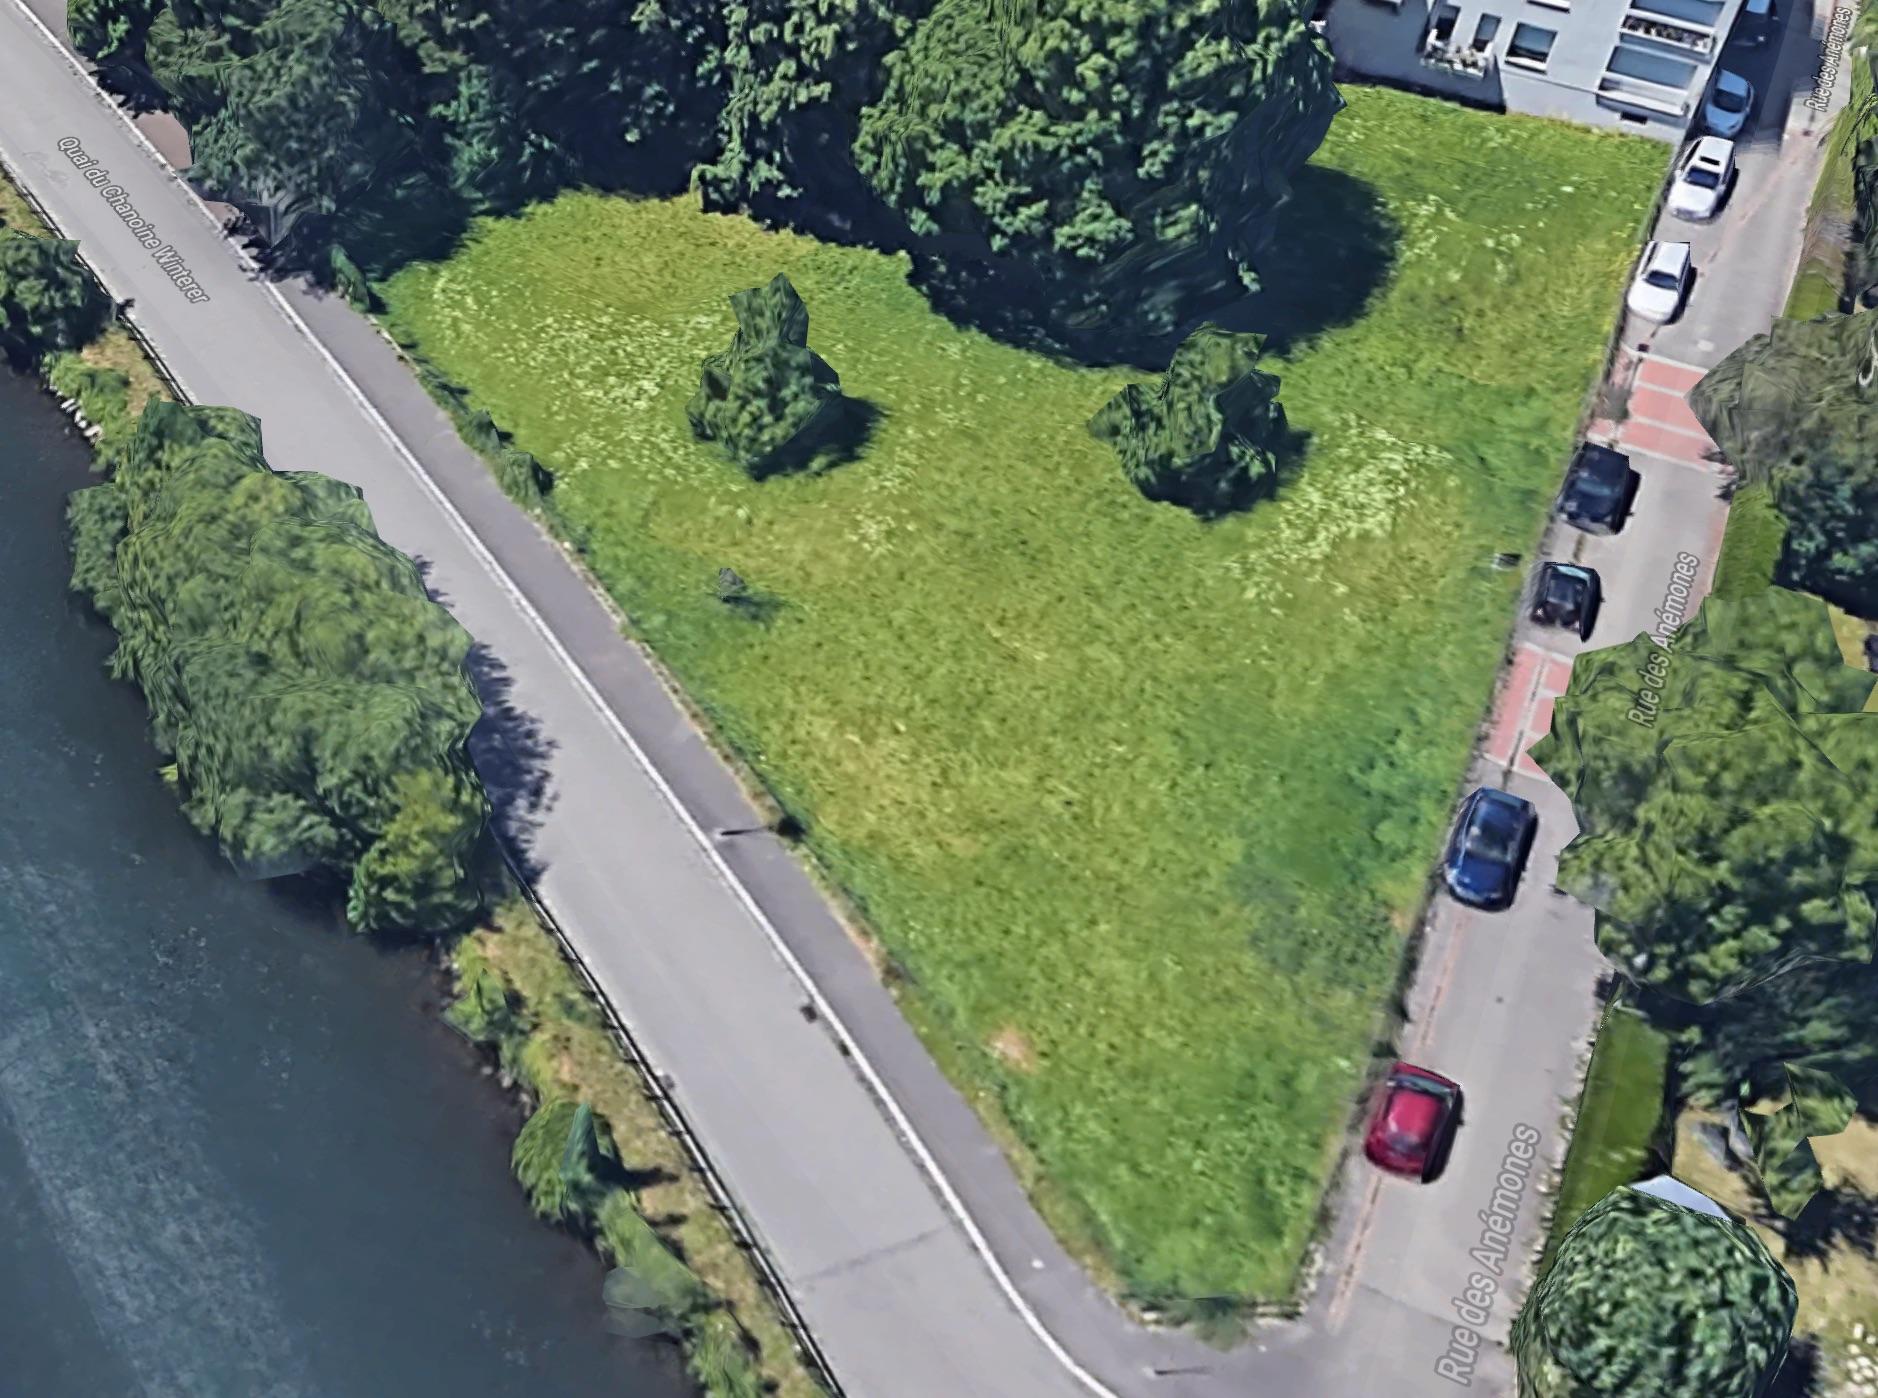 Groupe Anémones (Wacken) #ConsultationAutopromotionVille - habitat participatif à Strasbourg